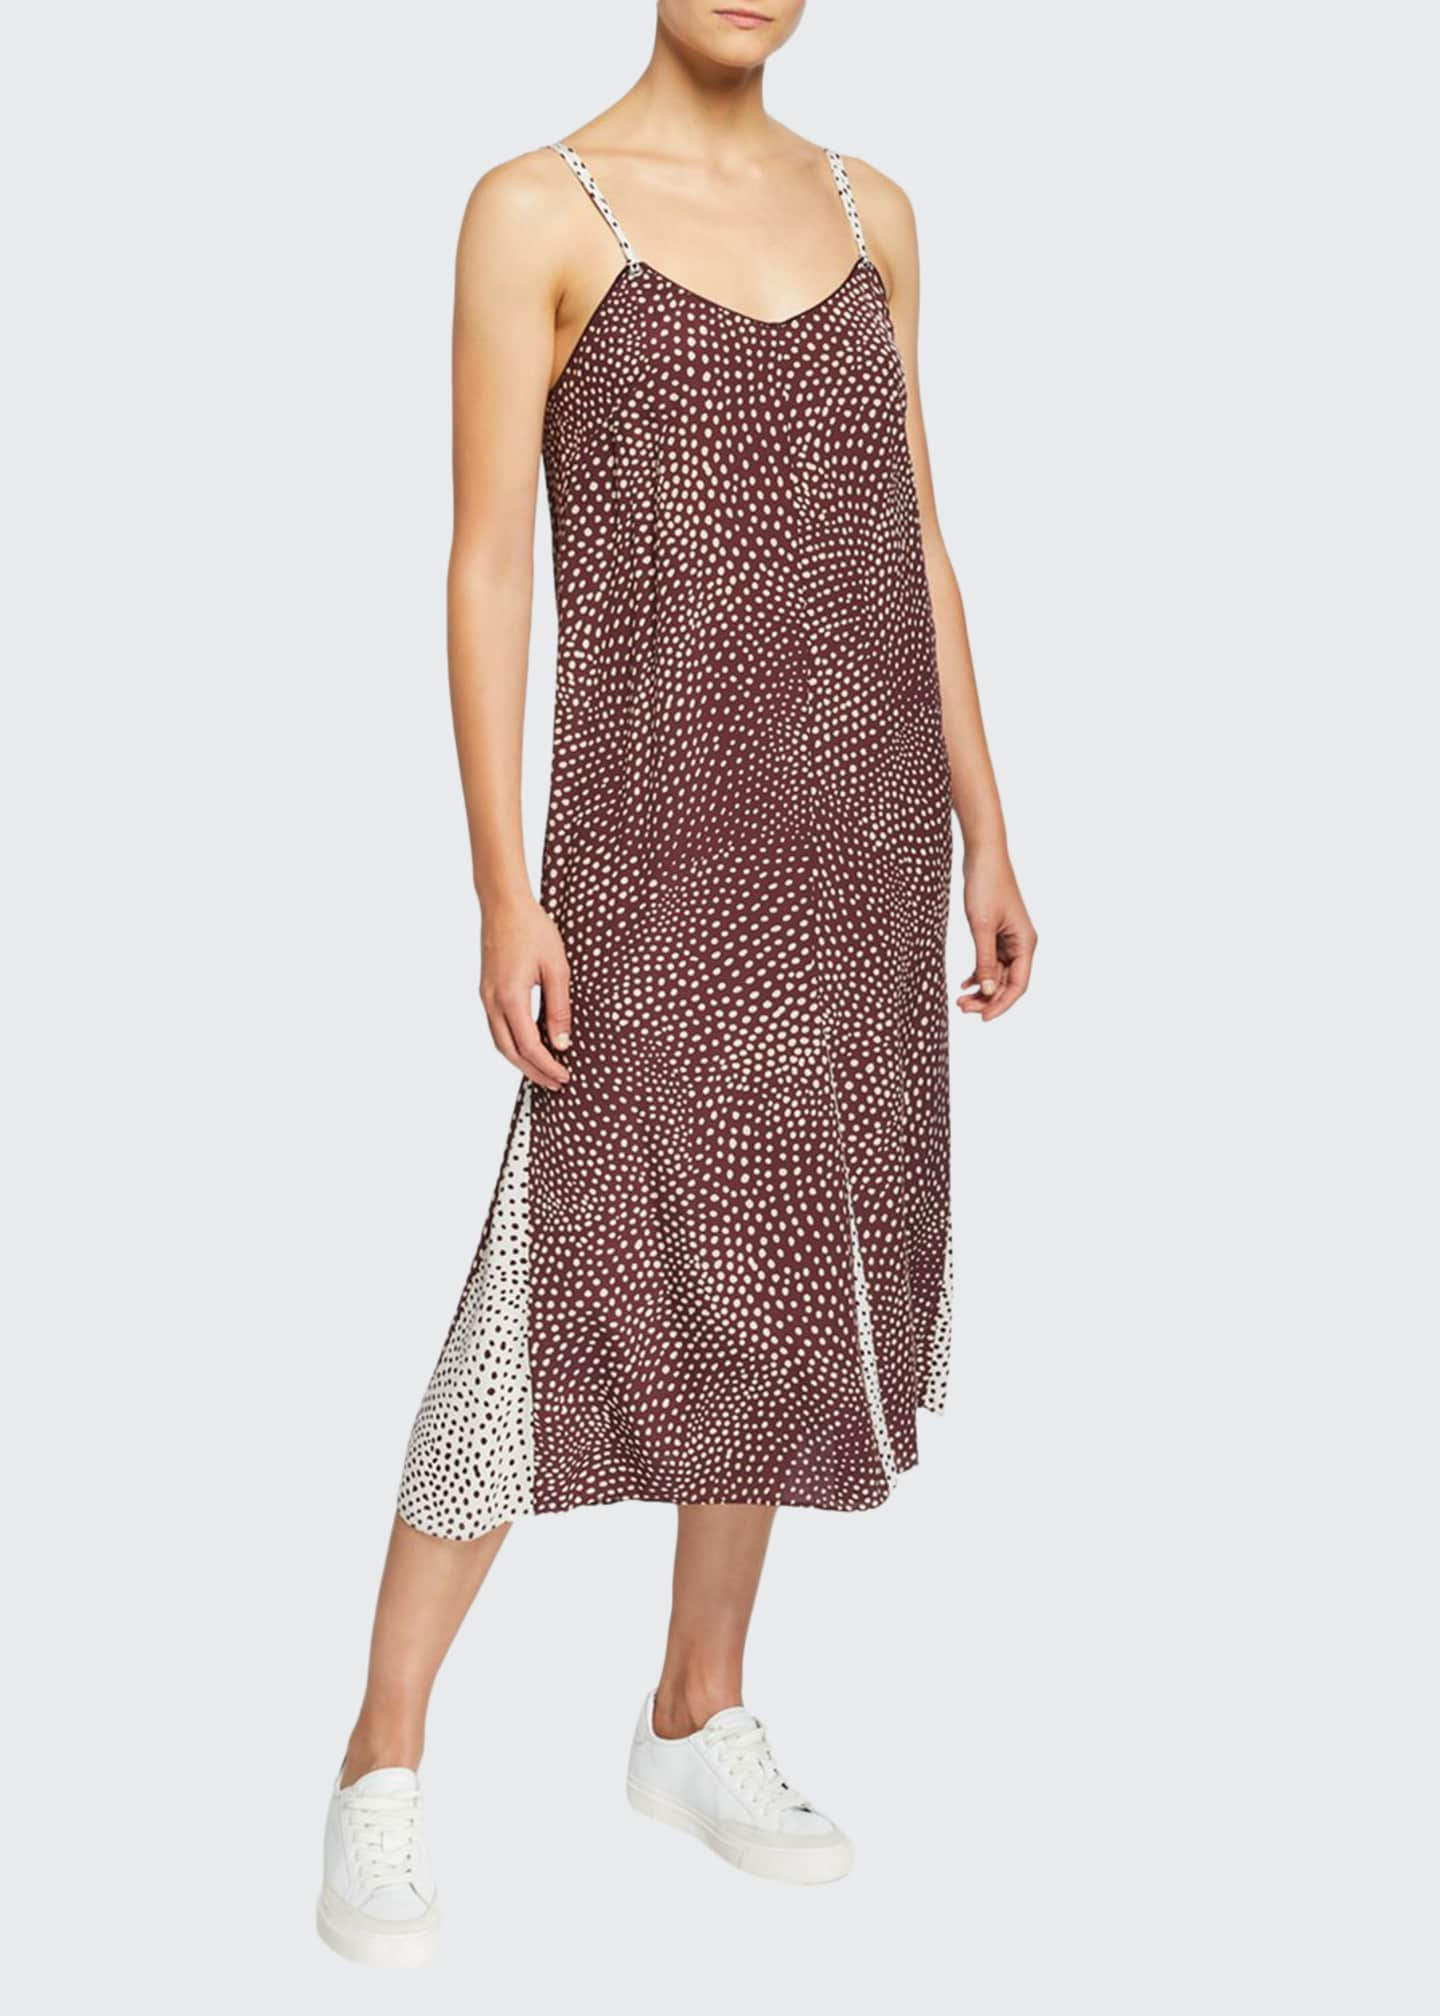 Rag & Bone Dirdre Colorblock Dotted Tank Dress